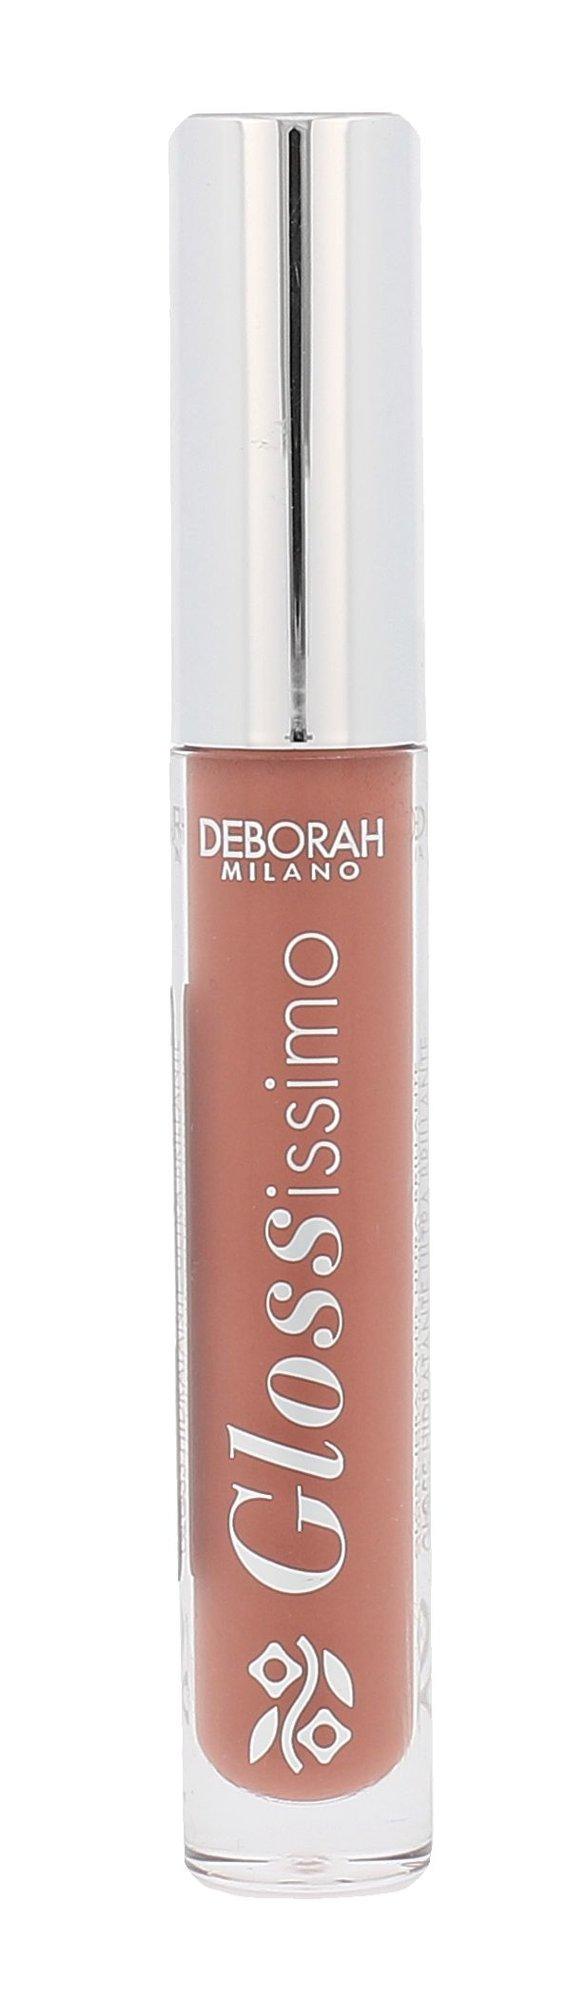 Deborah Milano Glossissimo Cosmetic 10ml 18